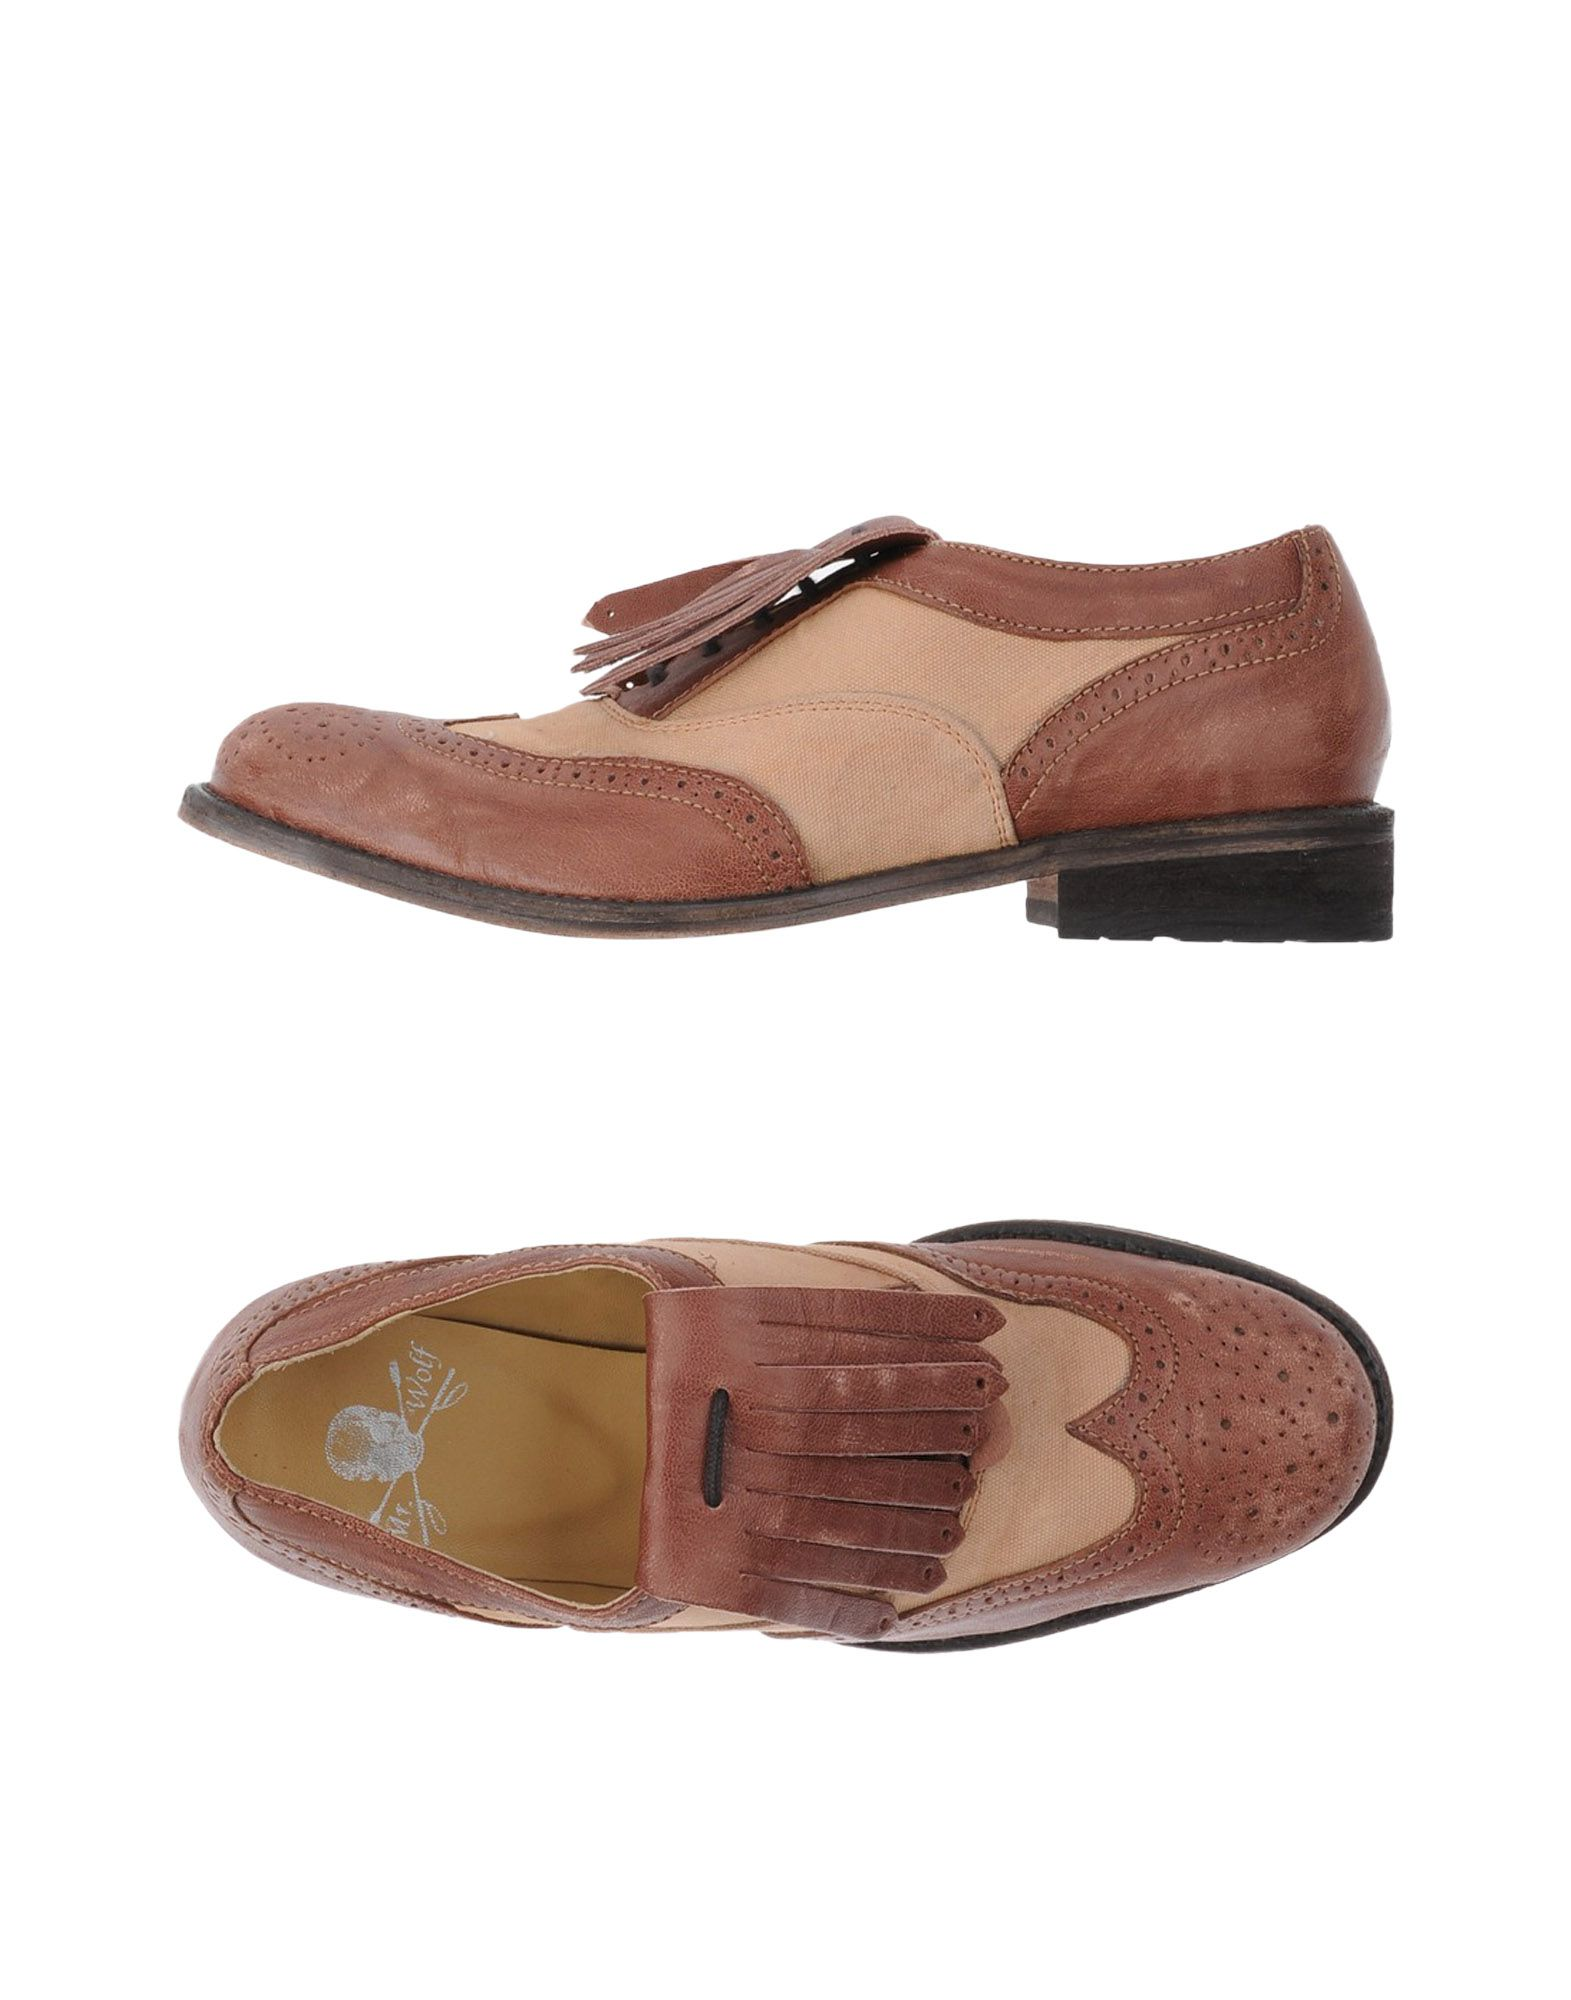 MR. WOLF Обувь на шнурках детская кожаная обувь mr baby wa15 096 mr baby2015